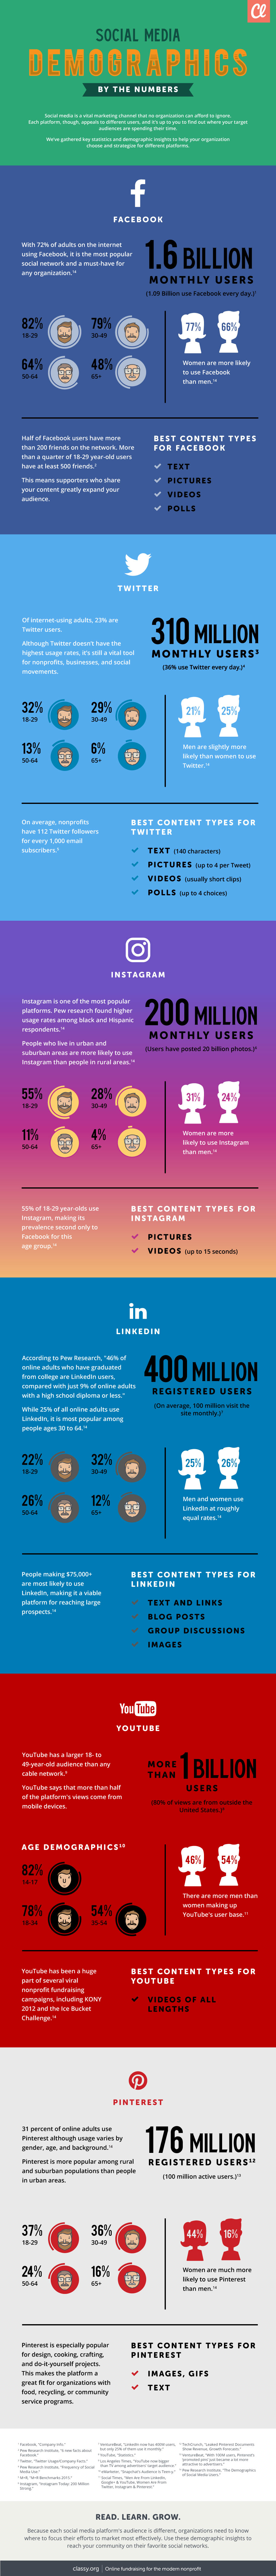 infographic social media demographics